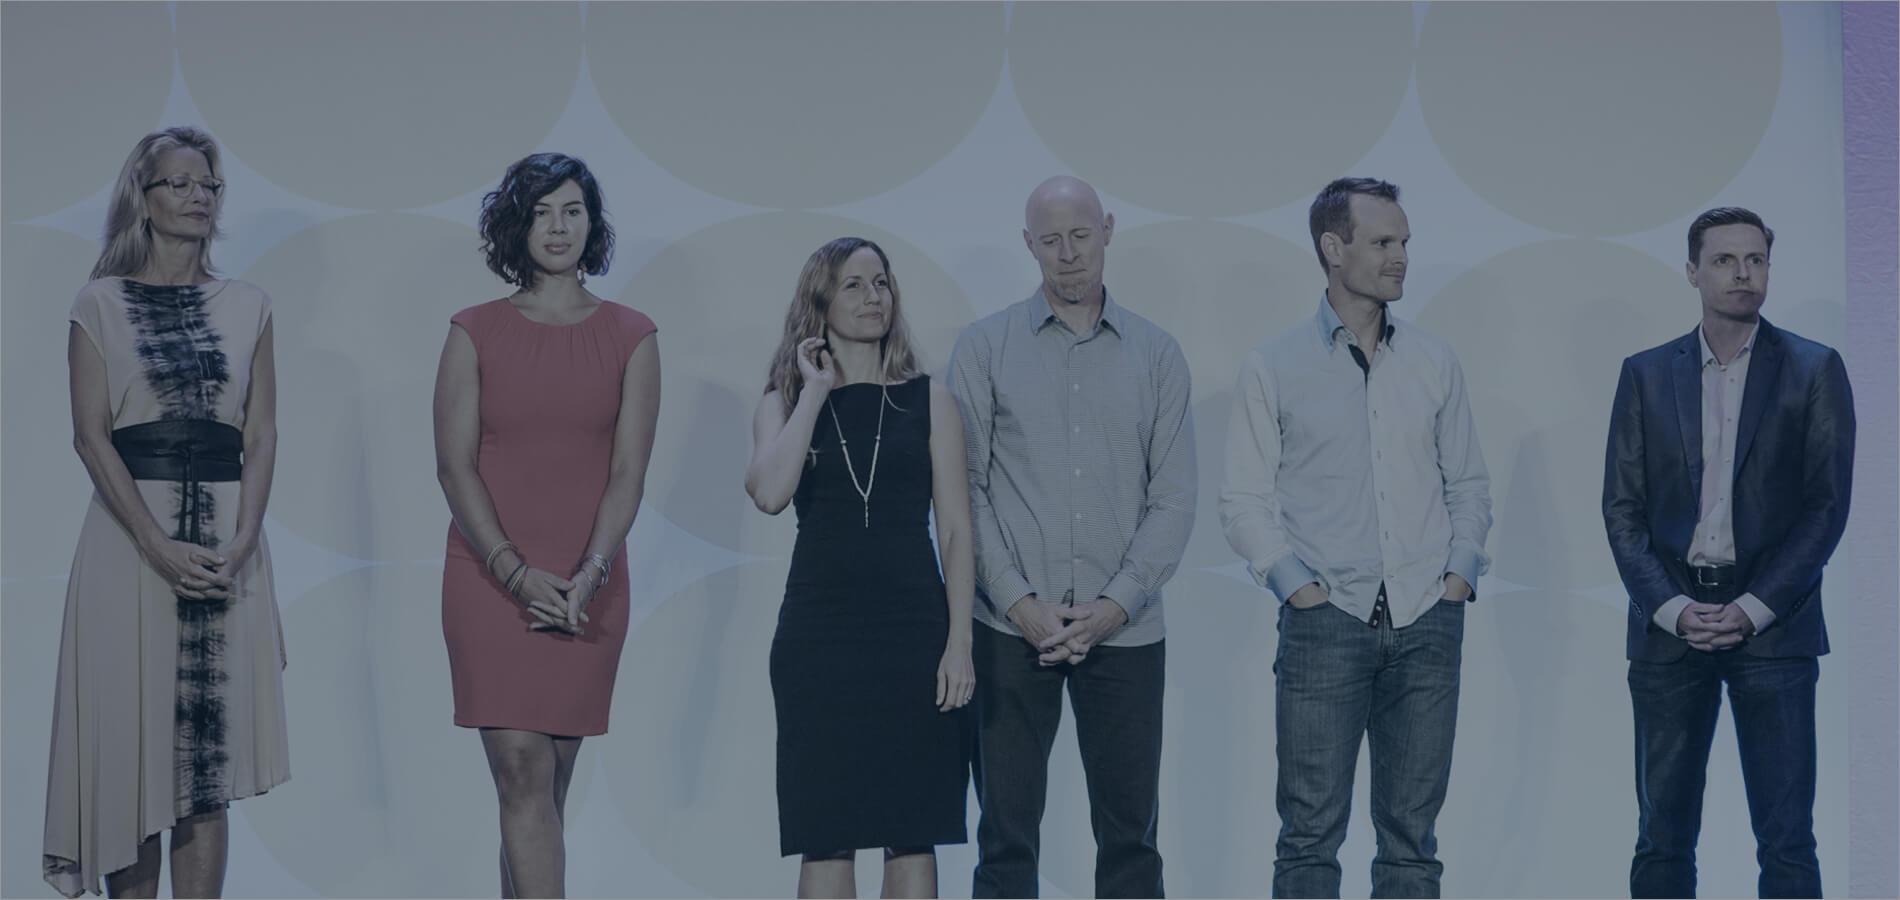 Entrepreneurial Advice from our Modern ONTRApreneur Winners